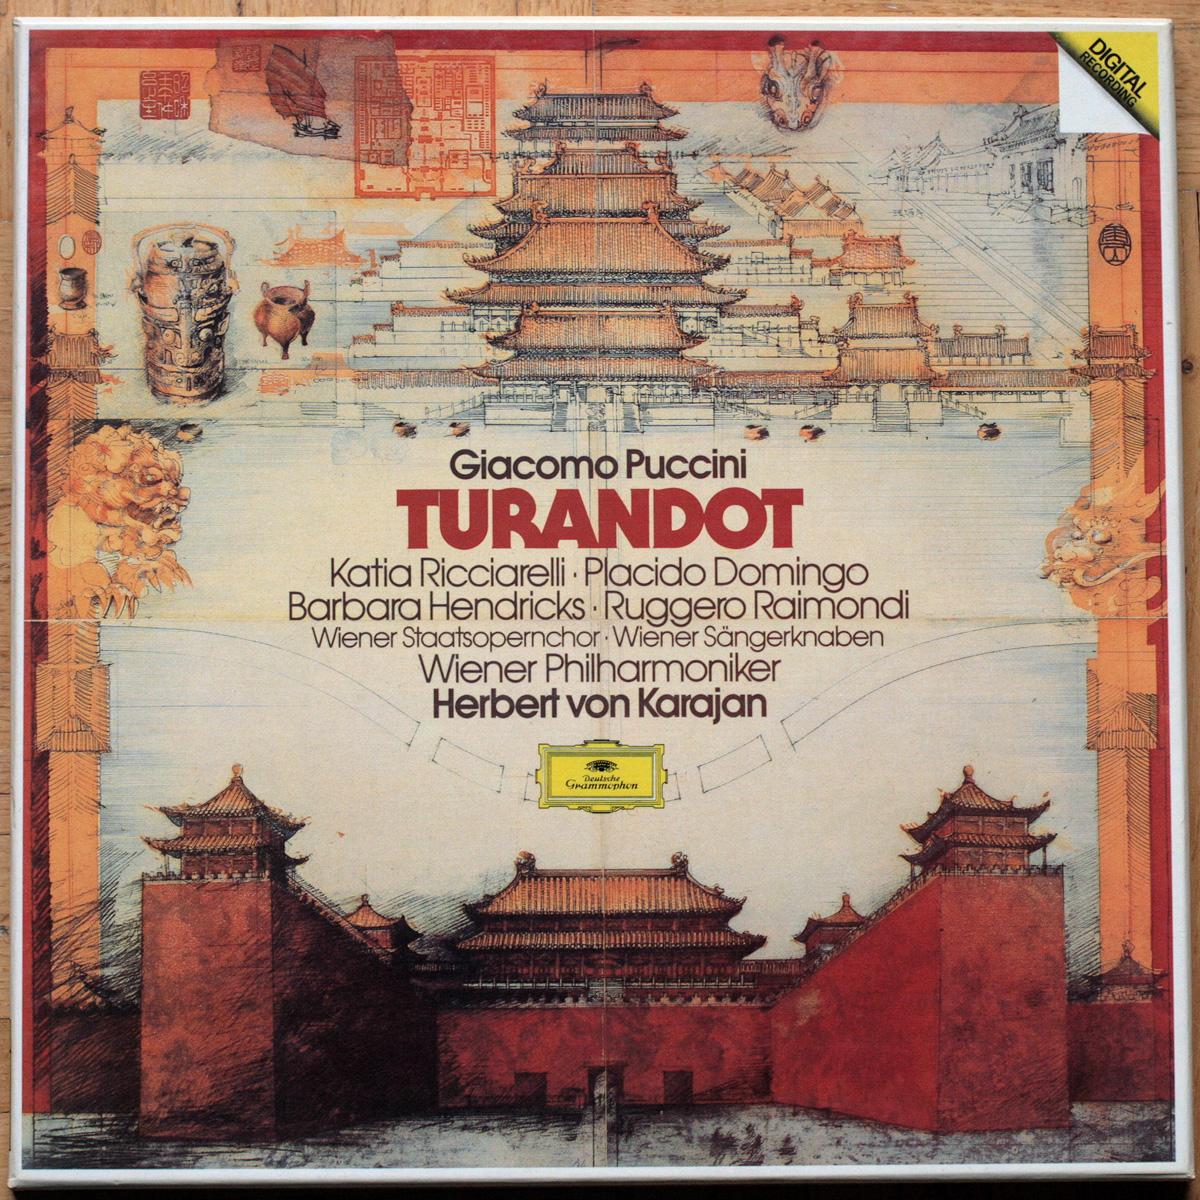 DGG 2741013_Puccini Turandot Karajan